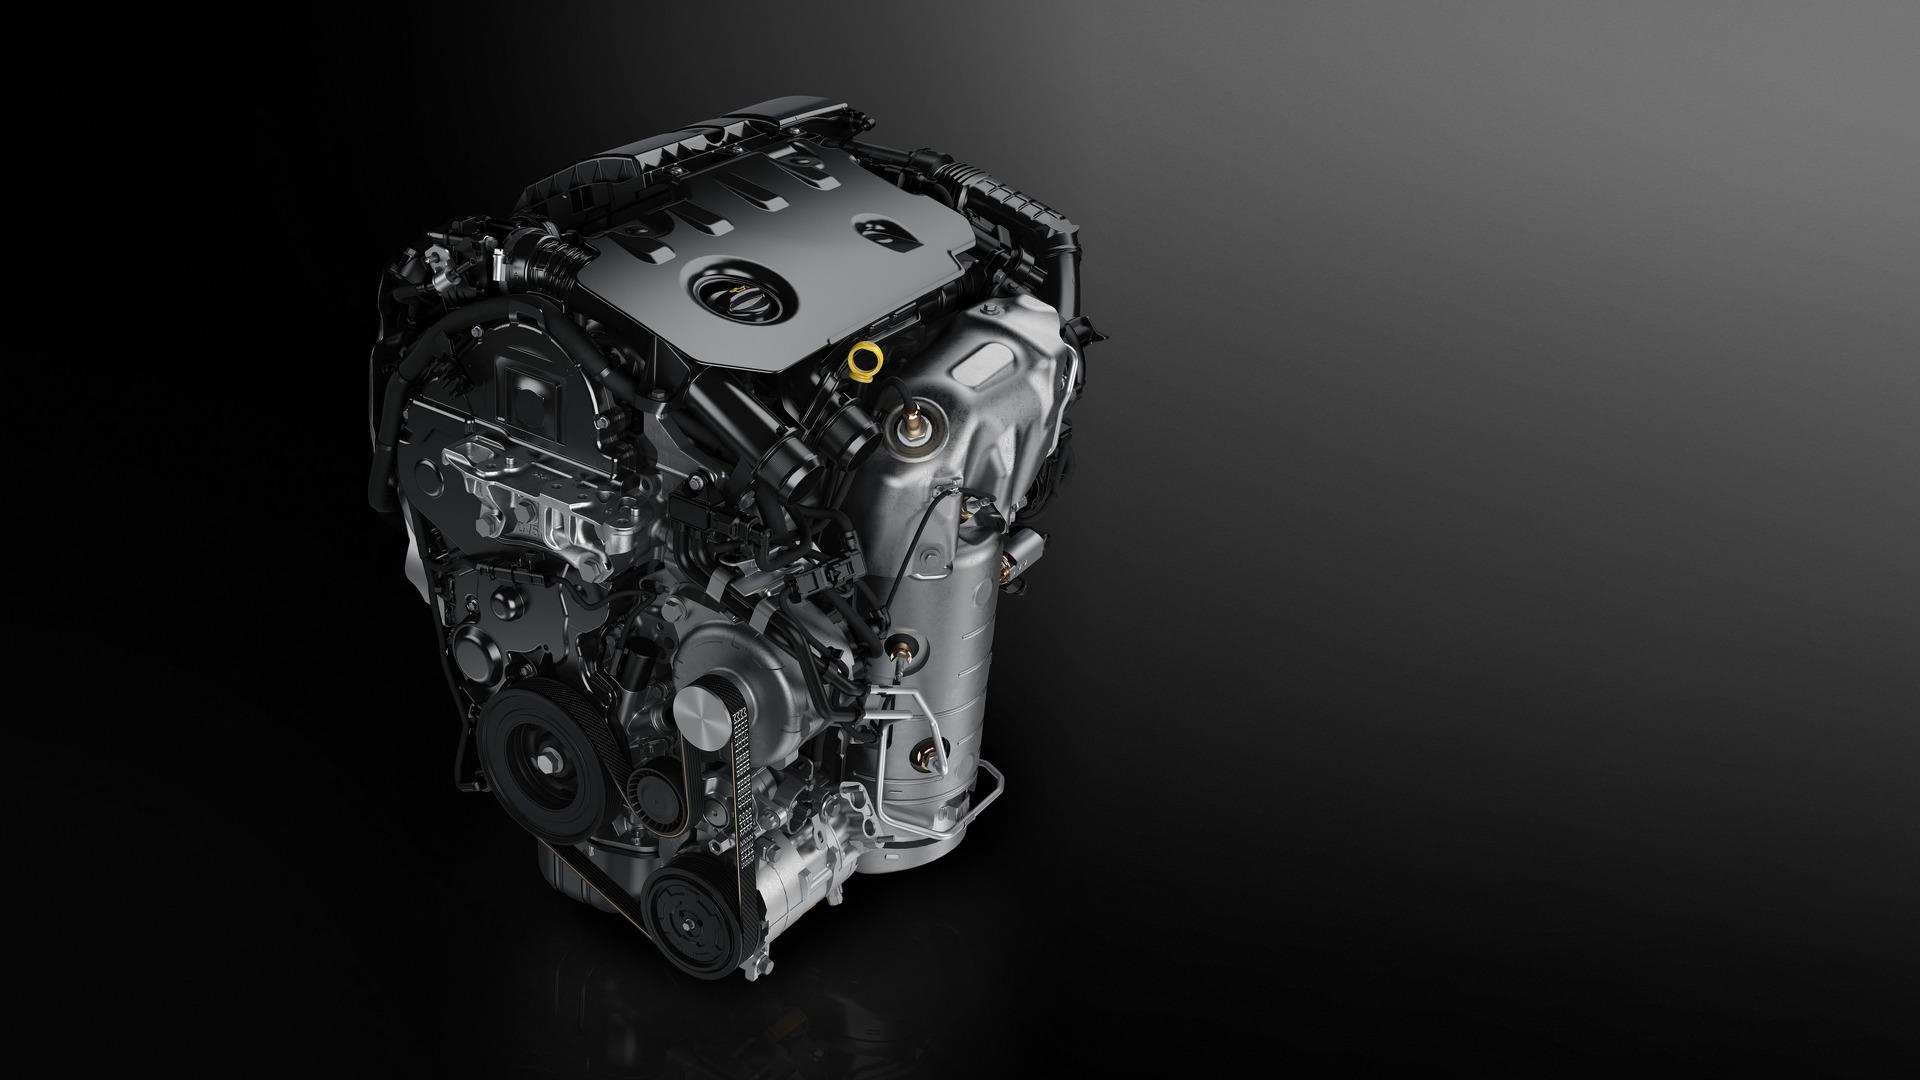 2018-peugeot-308-facelift (6)